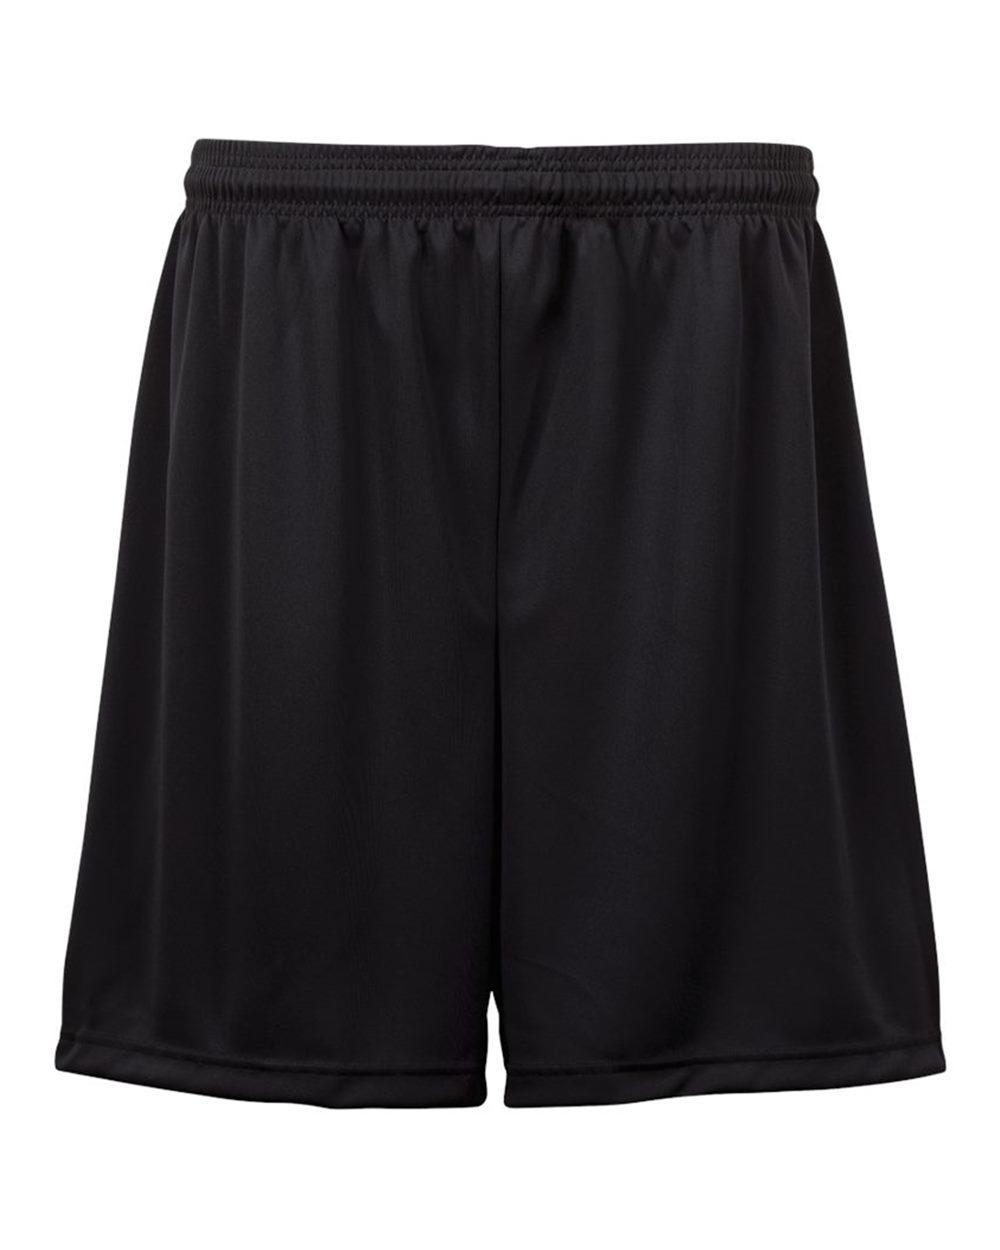 C2 Sport 5229 black